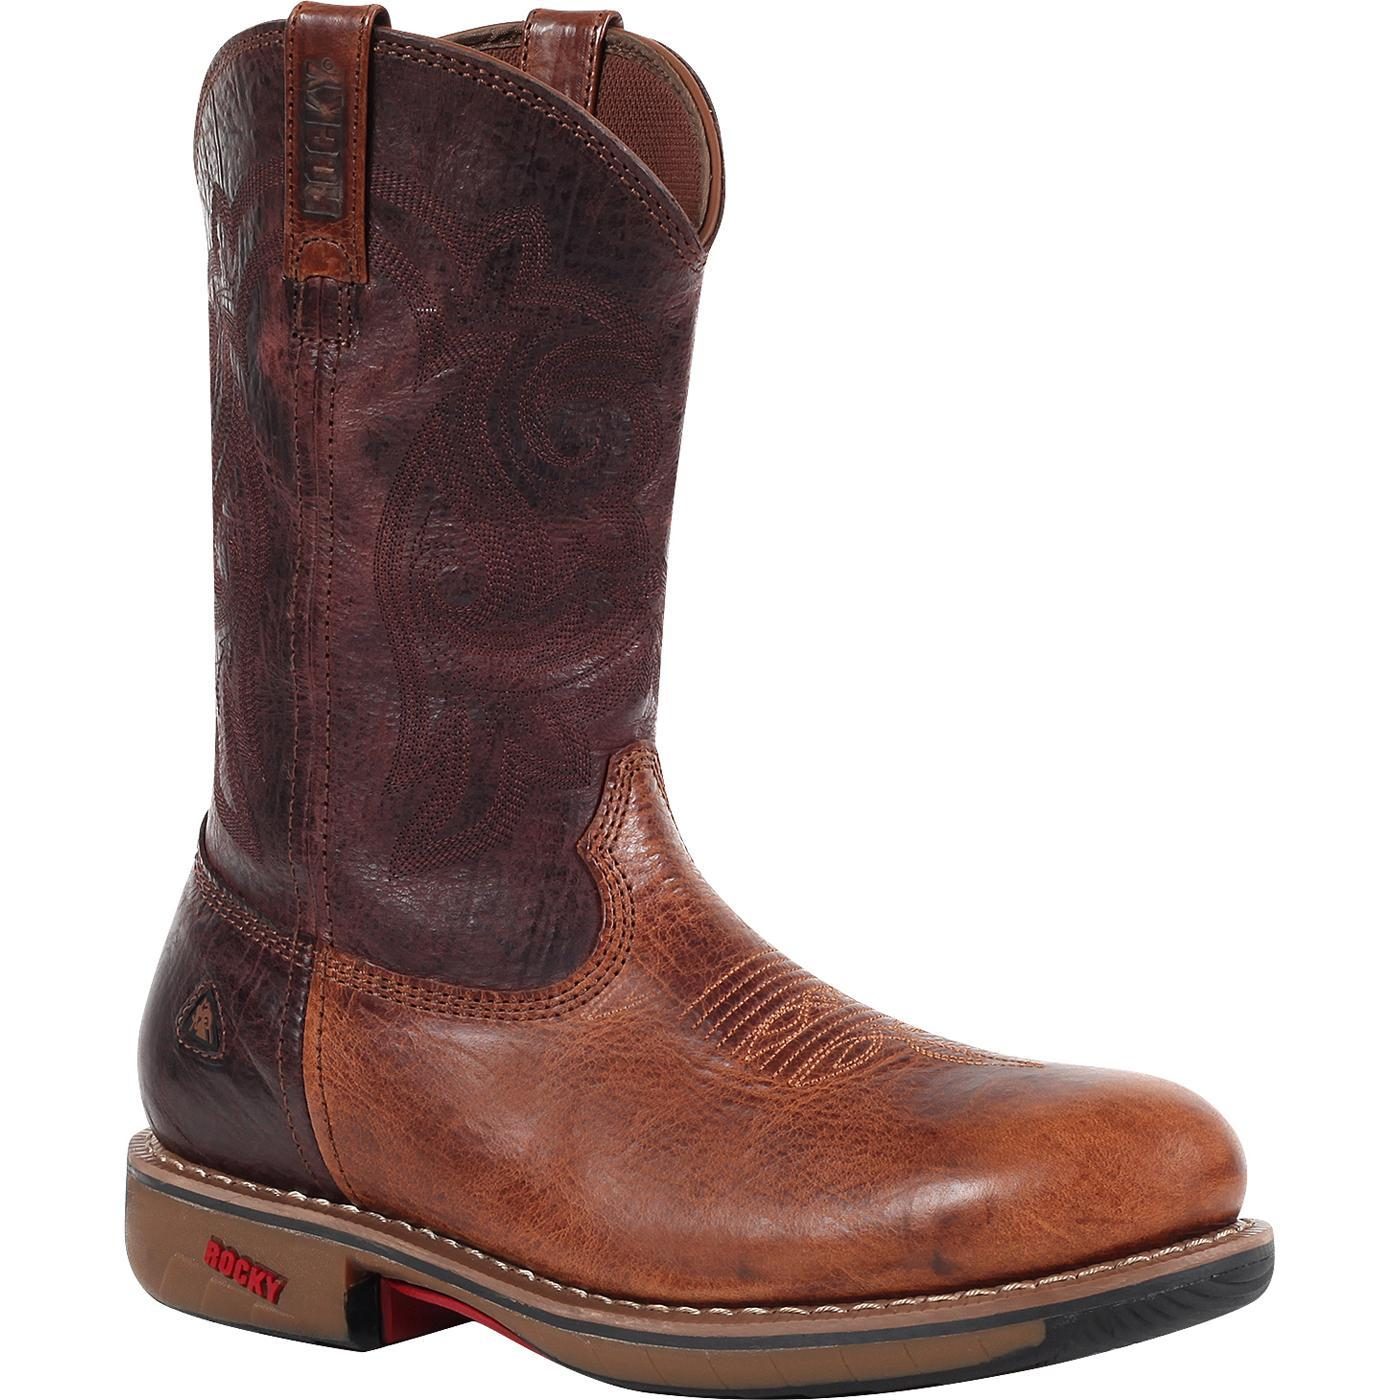 899b80a0f3c Rocky RIDE Western Boot